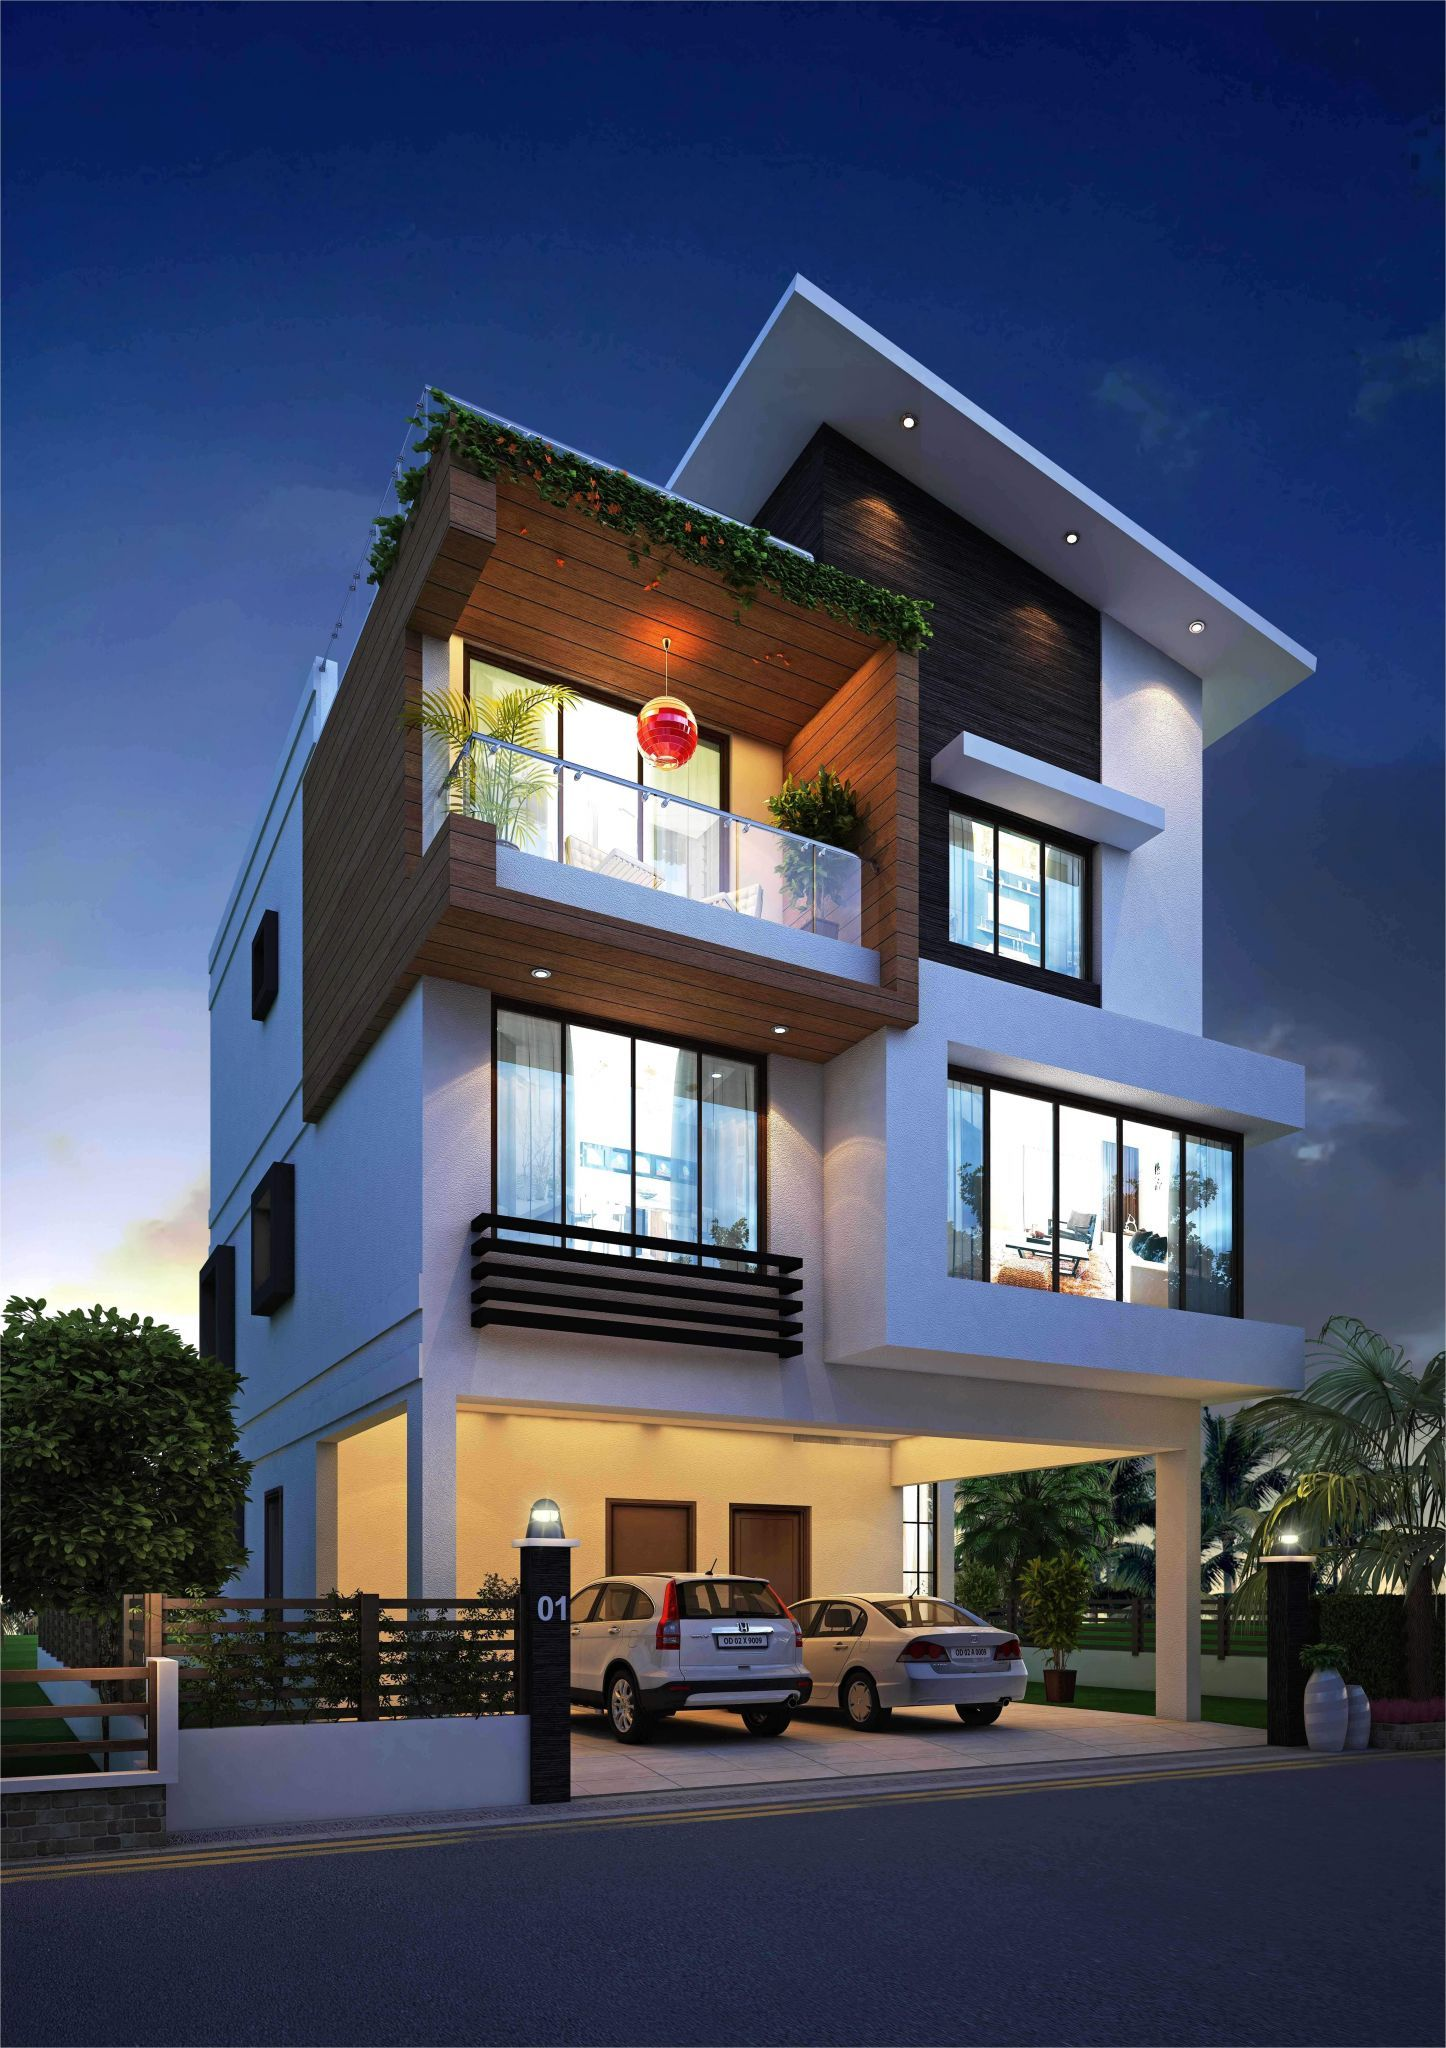 3D Floor Plans for Real Estate   Dream house exterior, Modern house exterior, House designs exterior